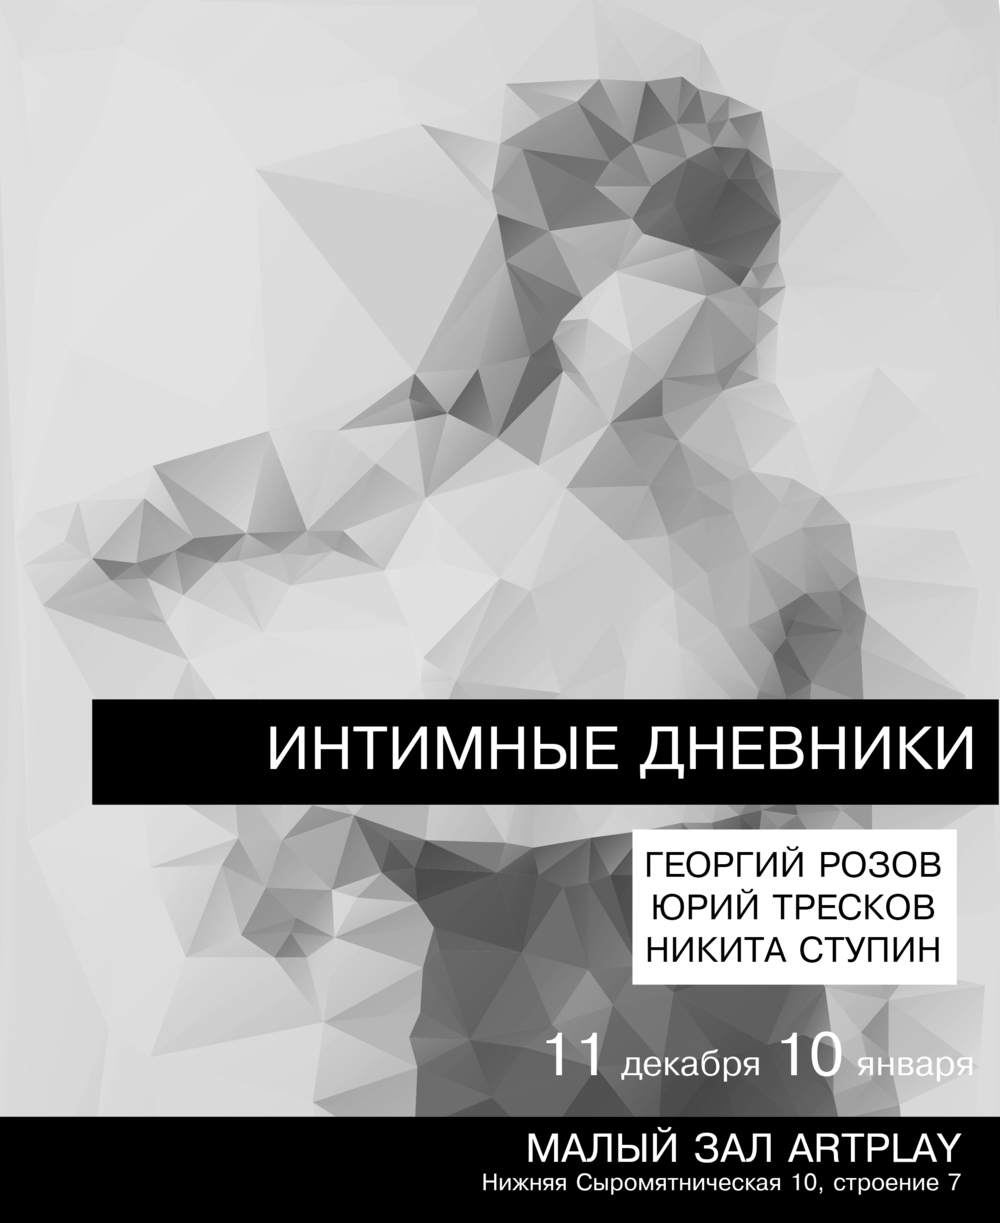 2_1_нов.jpg